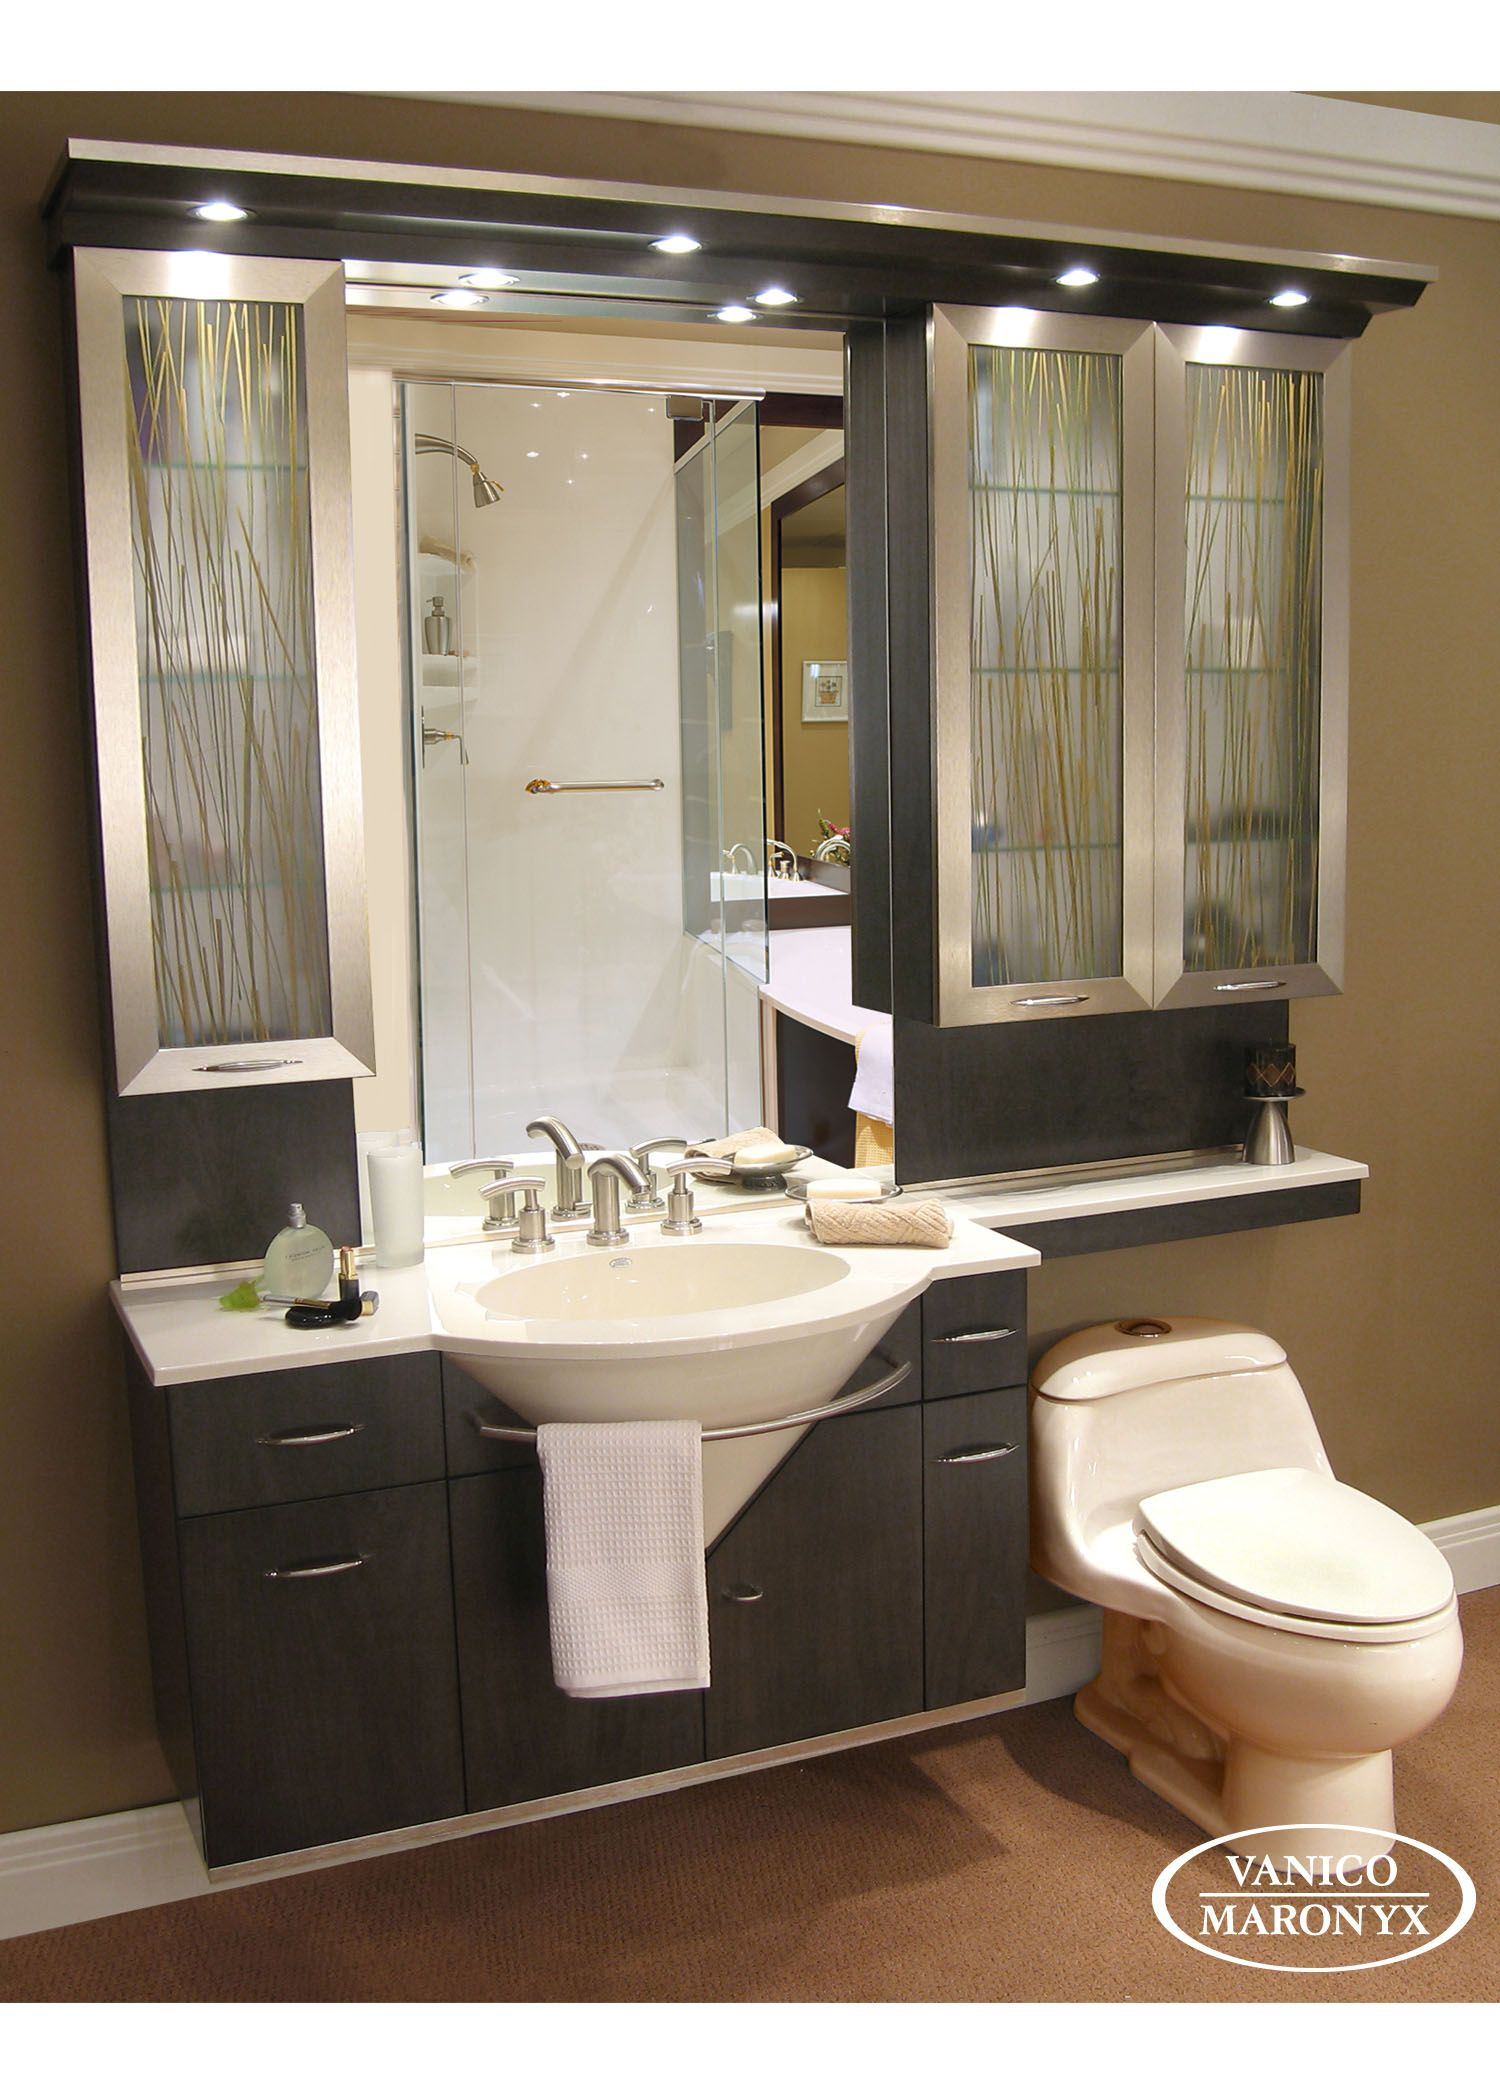 Modern Black Bath Vanity By Vanico Maronyx Avanti Collection